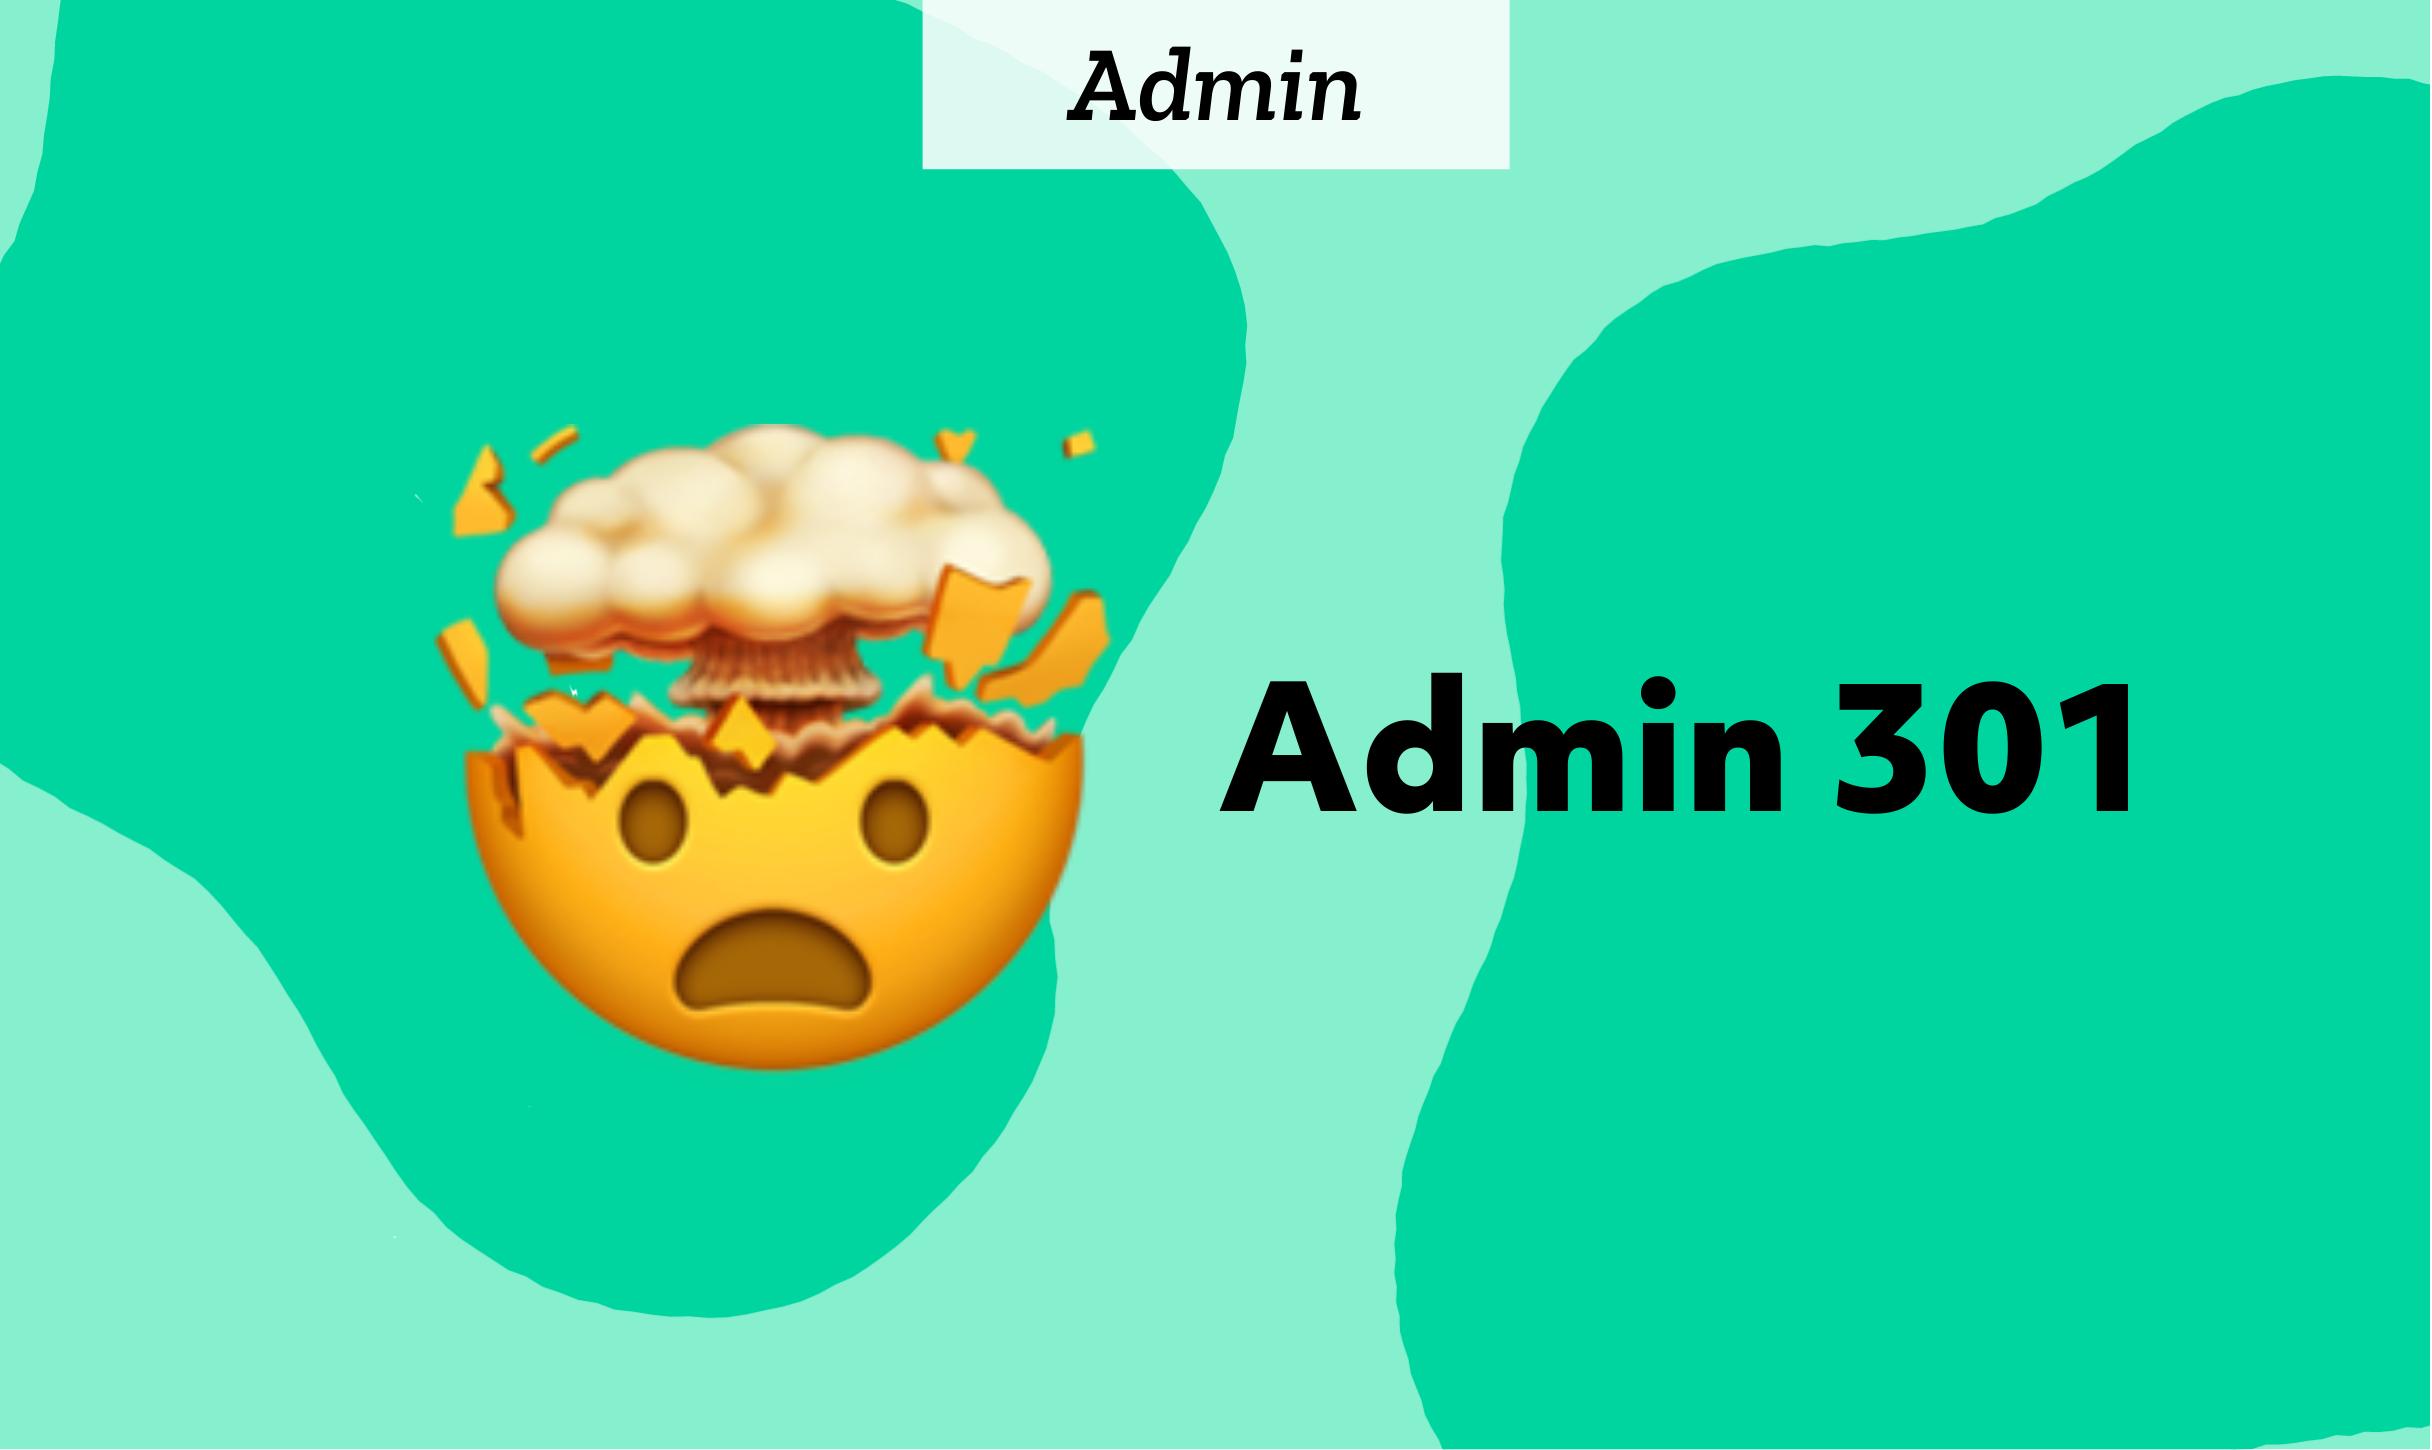 Admin 301